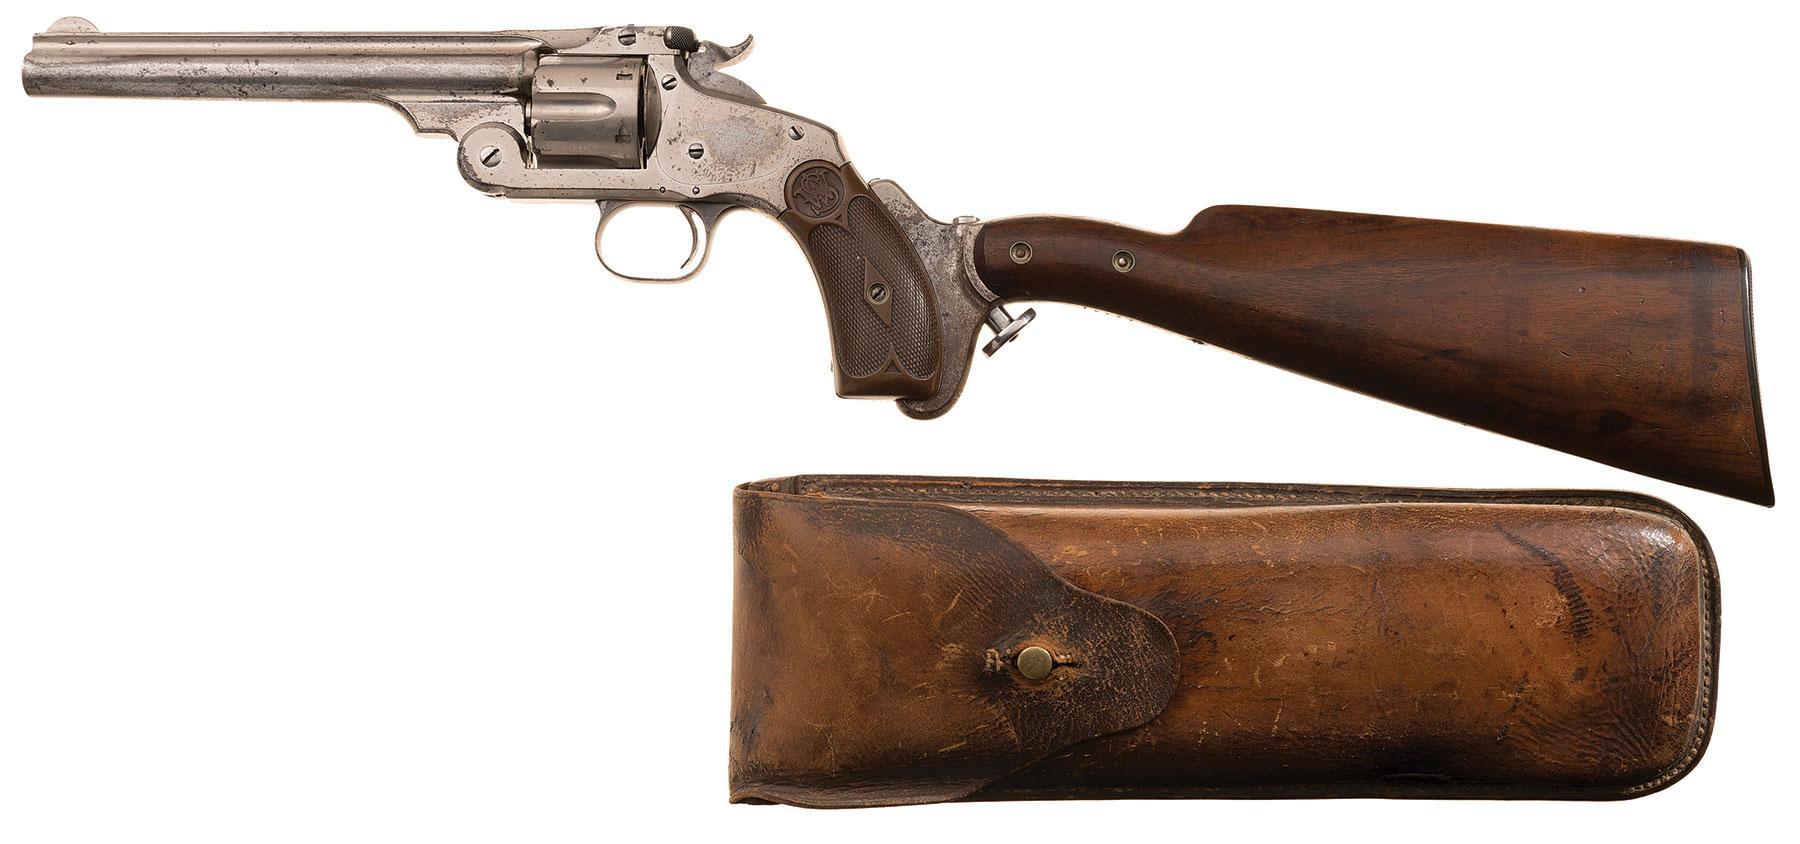 Smith & Wesson No. 3 South Australia Police revolver carbine detachable stock